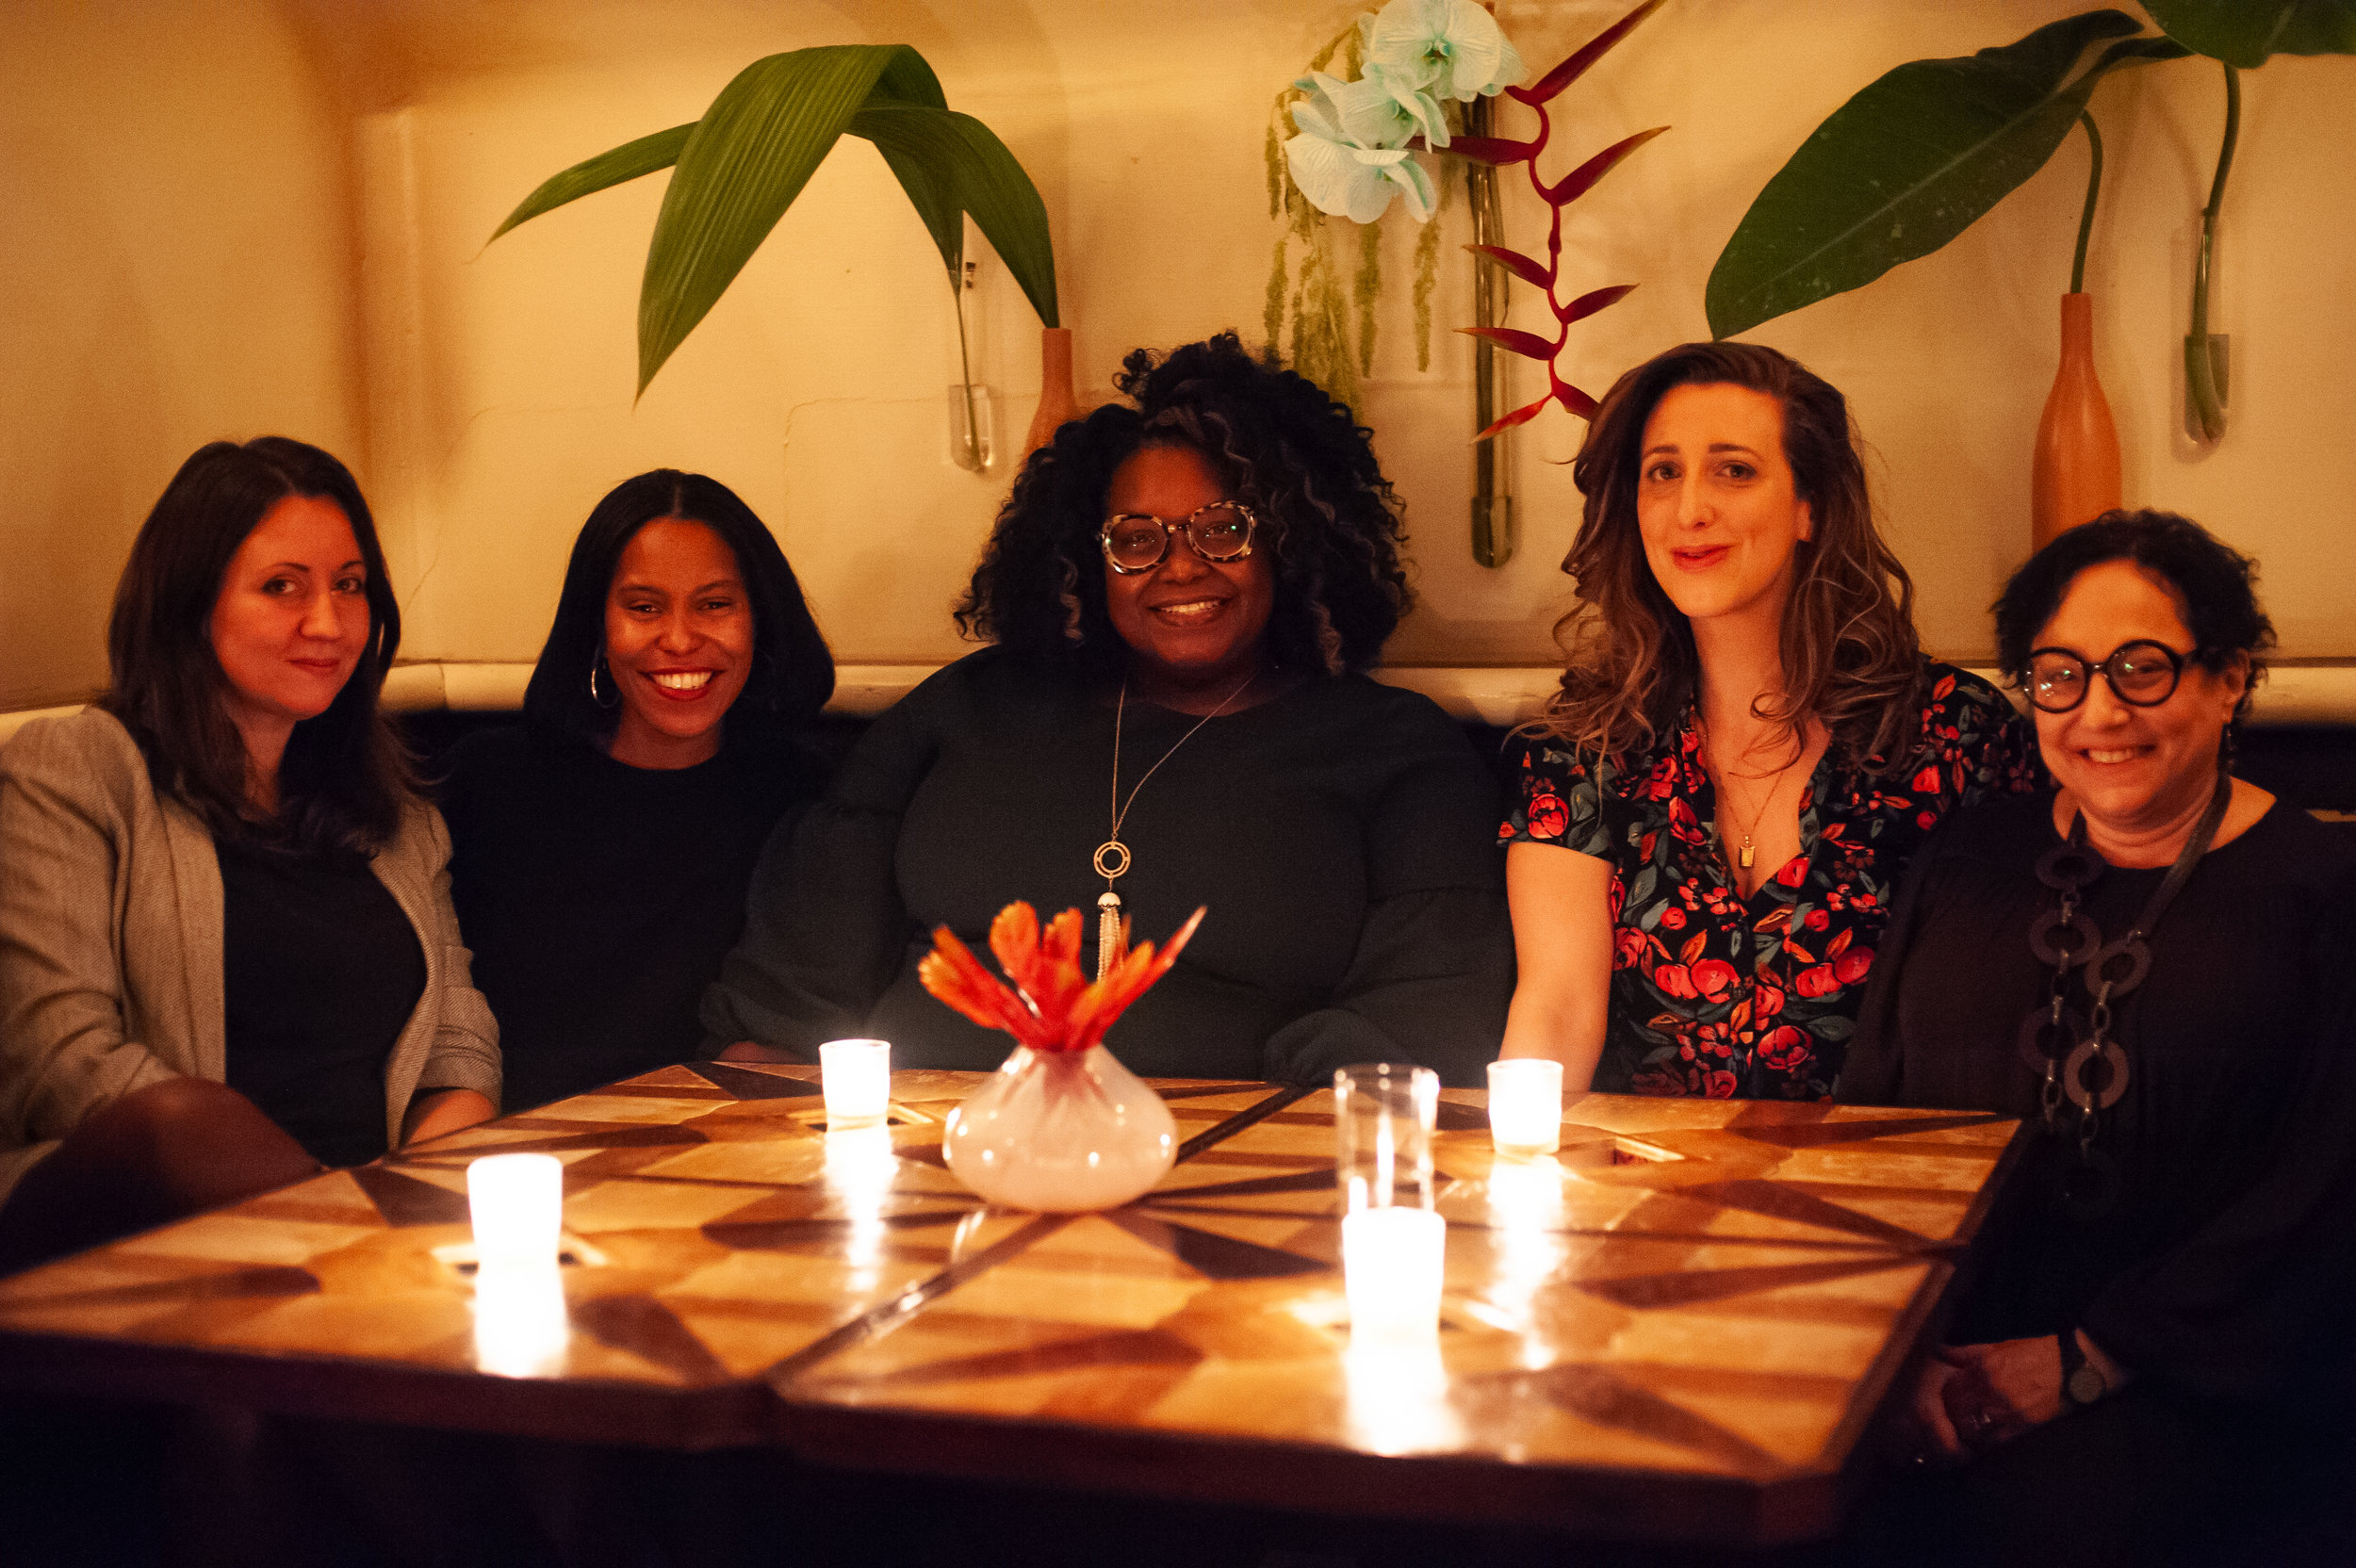 Freya Project Readers Raluca Albu, Camille Drummond, Joi Chaney, Jolenta Greenberg, and Lenora Lapidus